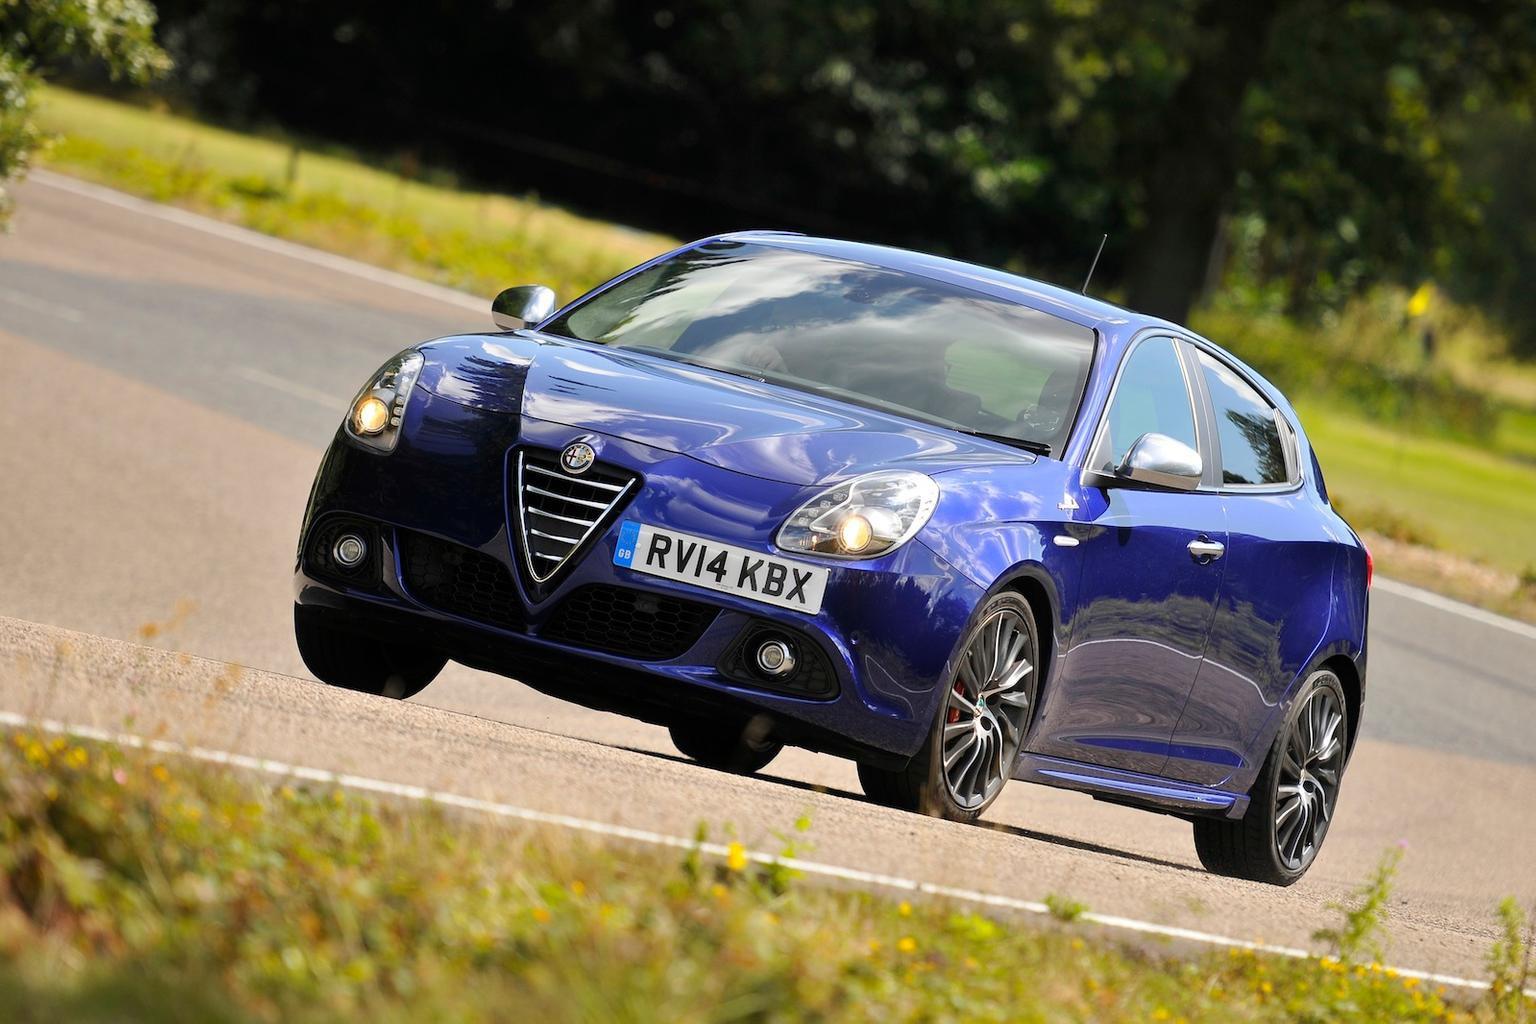 2014 Alfa Romeo Giulietta 1.4 MultiAir 170 TCT review